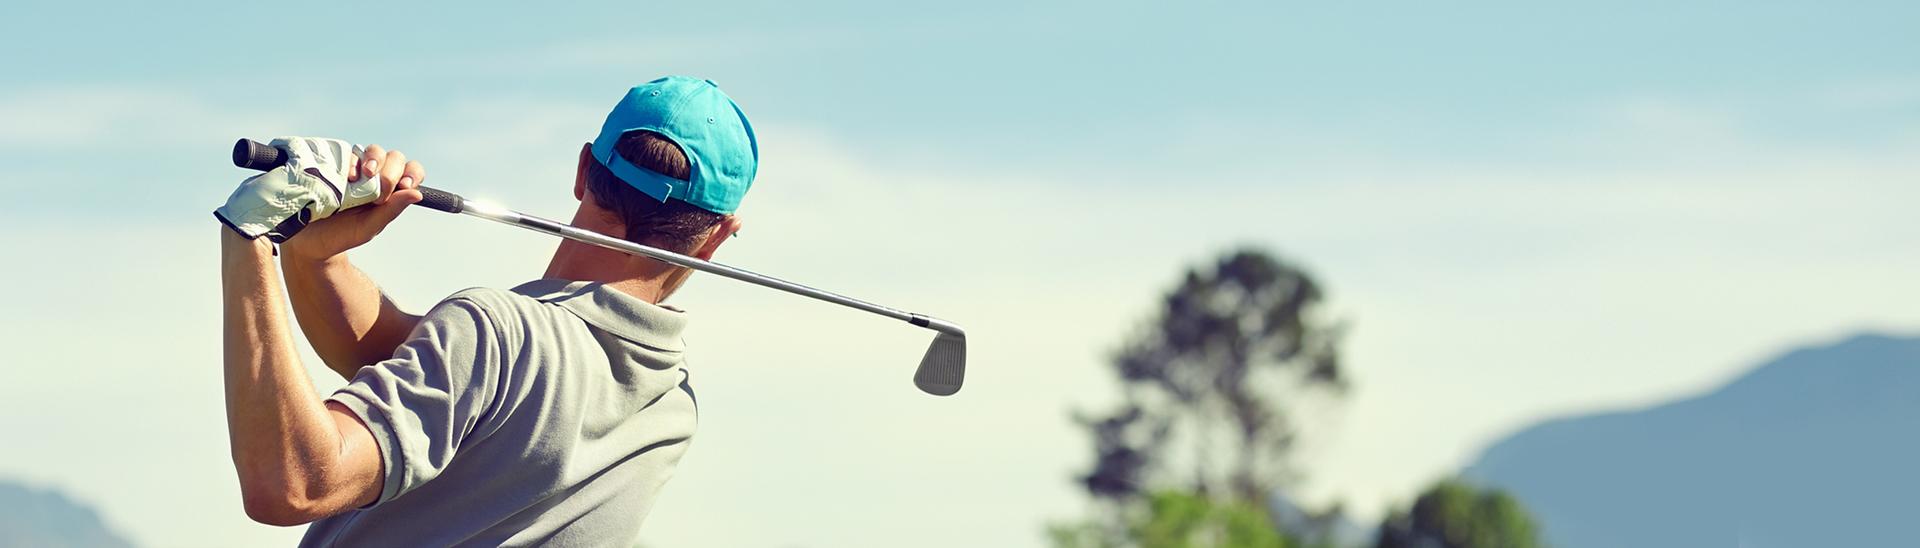 slider-bg-golf-heriot-ouverture